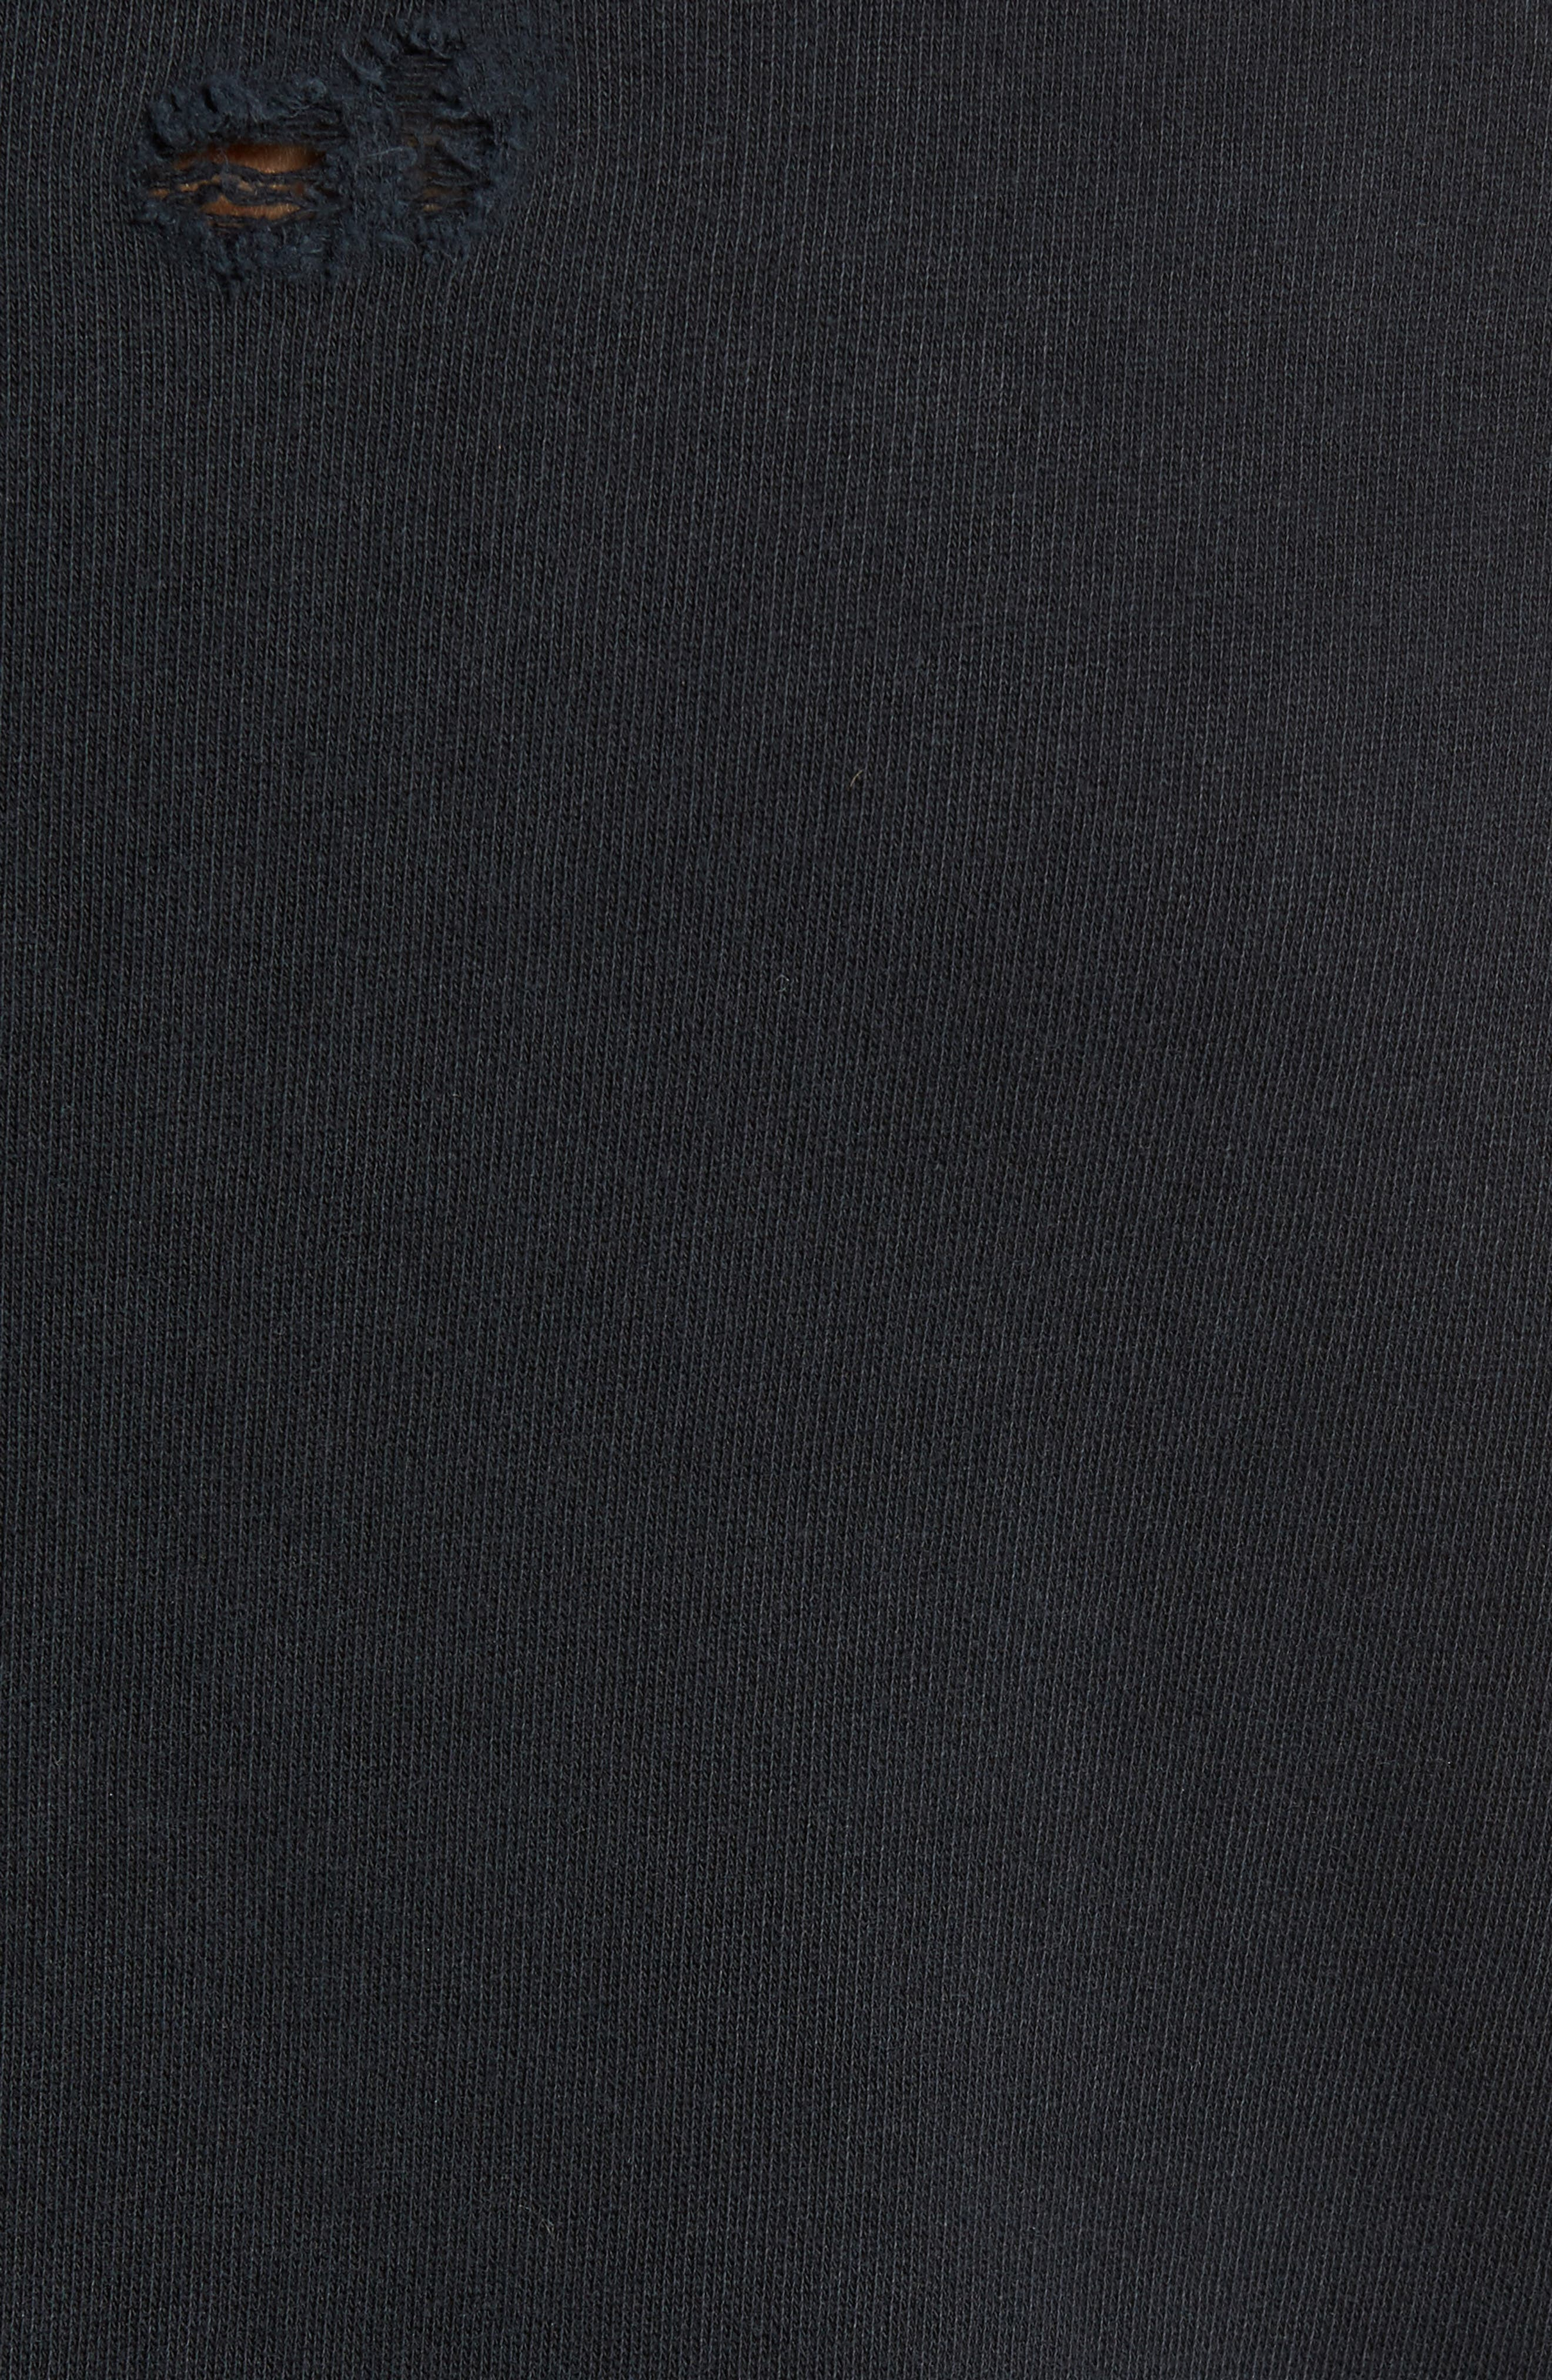 Striker Slim Fit Crewneck Sweatshirt,                             Alternate thumbnail 5, color,